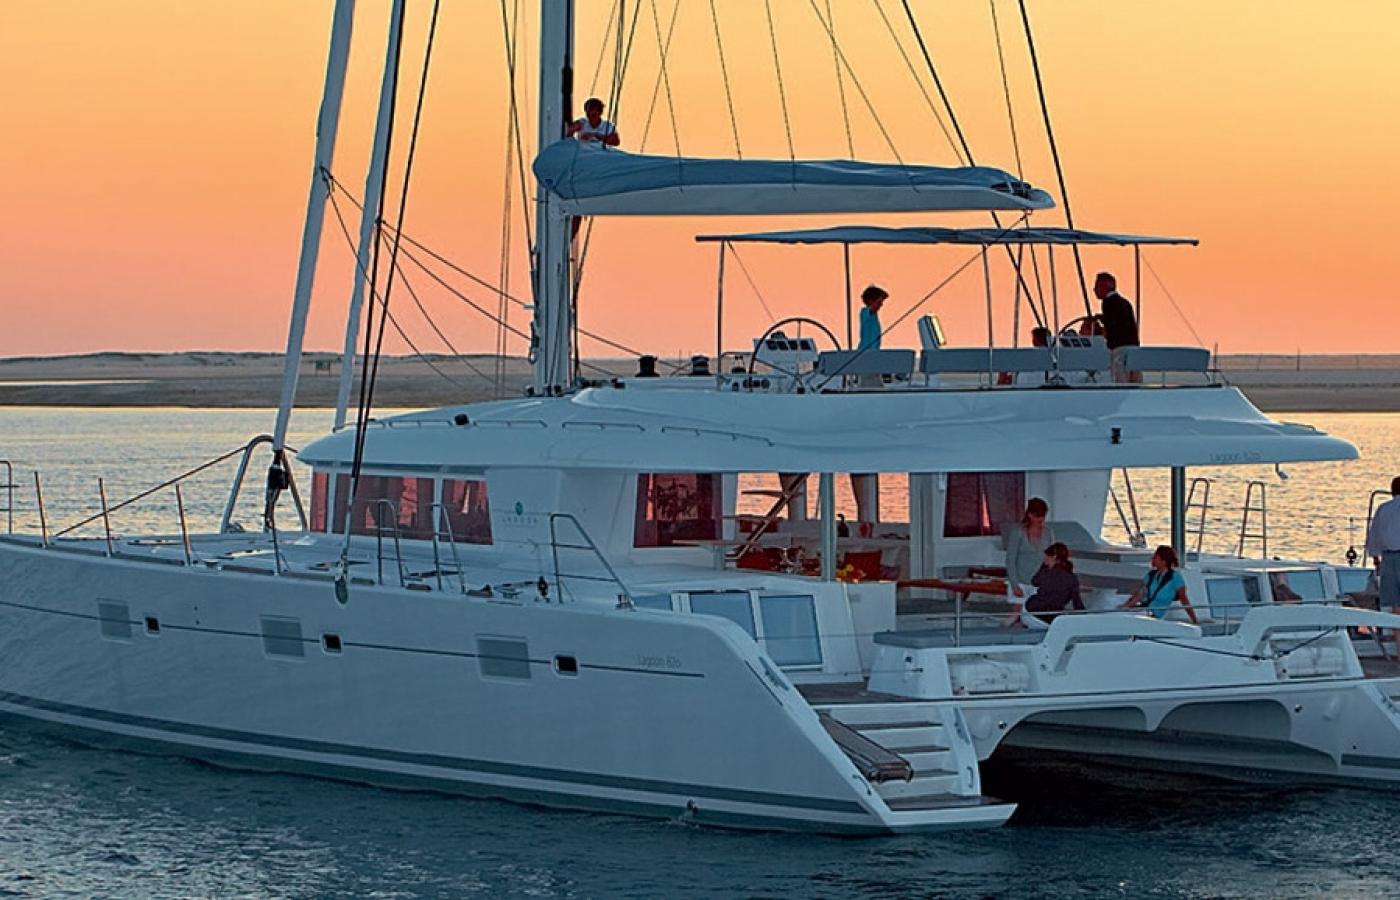 The perfect sunset on the Lagoon 62 - MyOffice